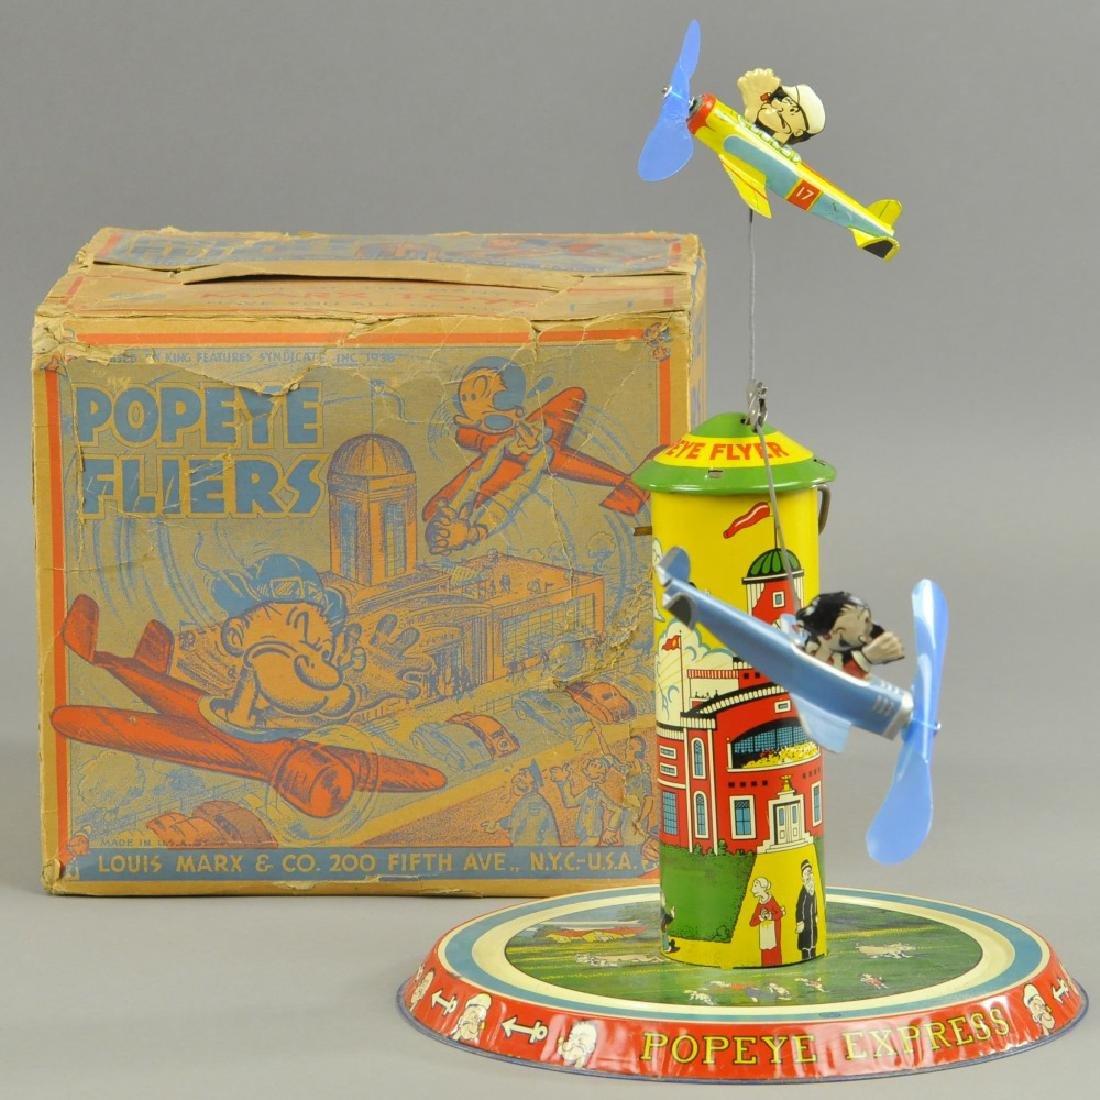 BOXED MARX POPEYE FLIERS